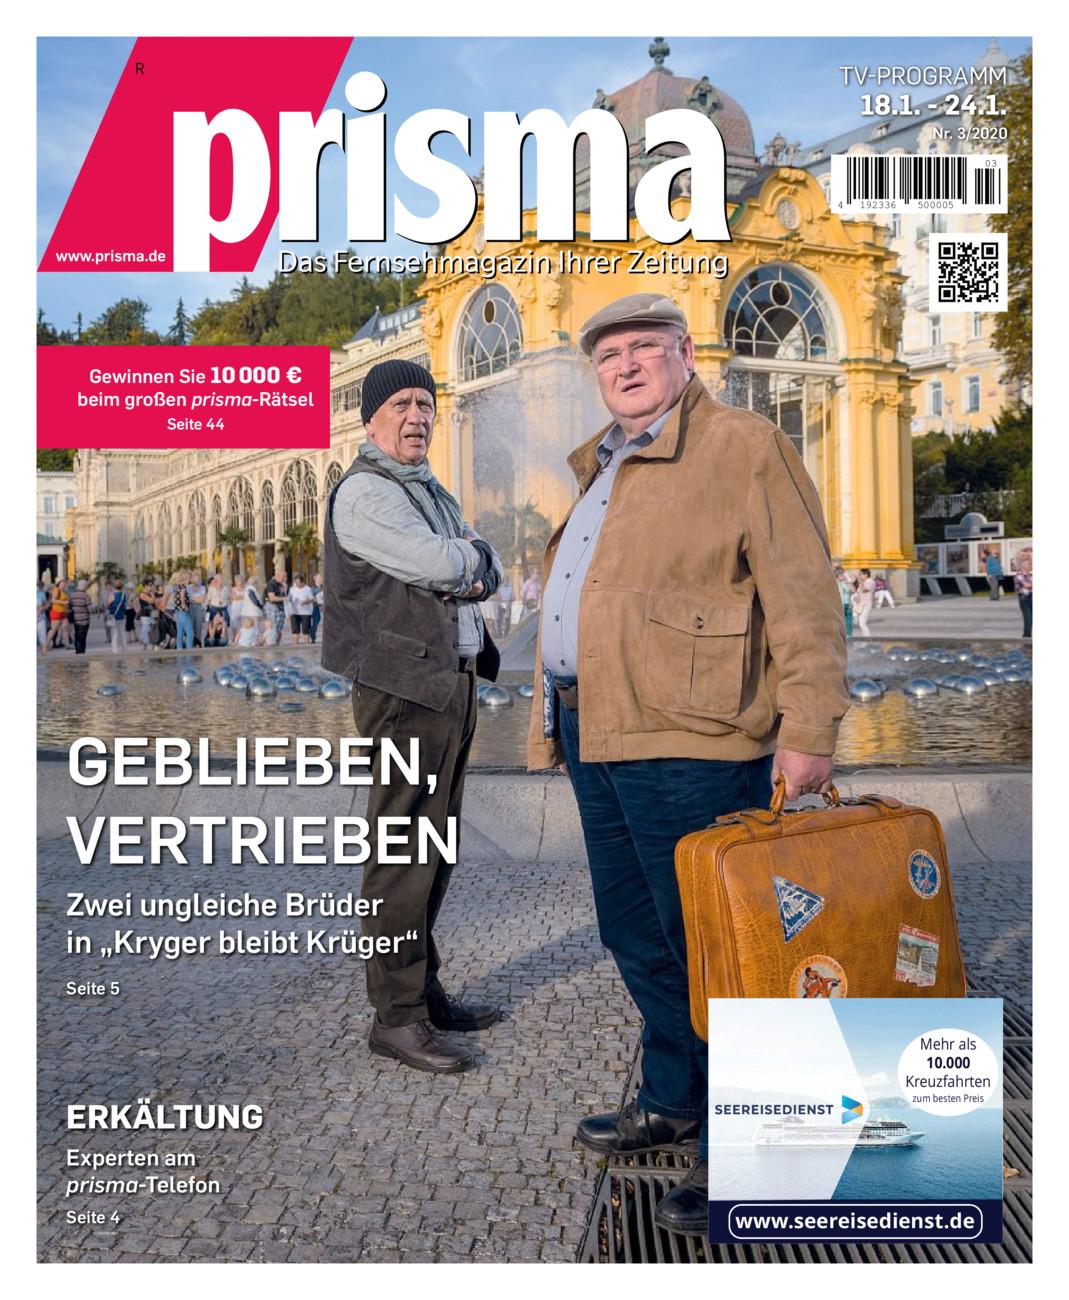 Prisma 18. - 24.1